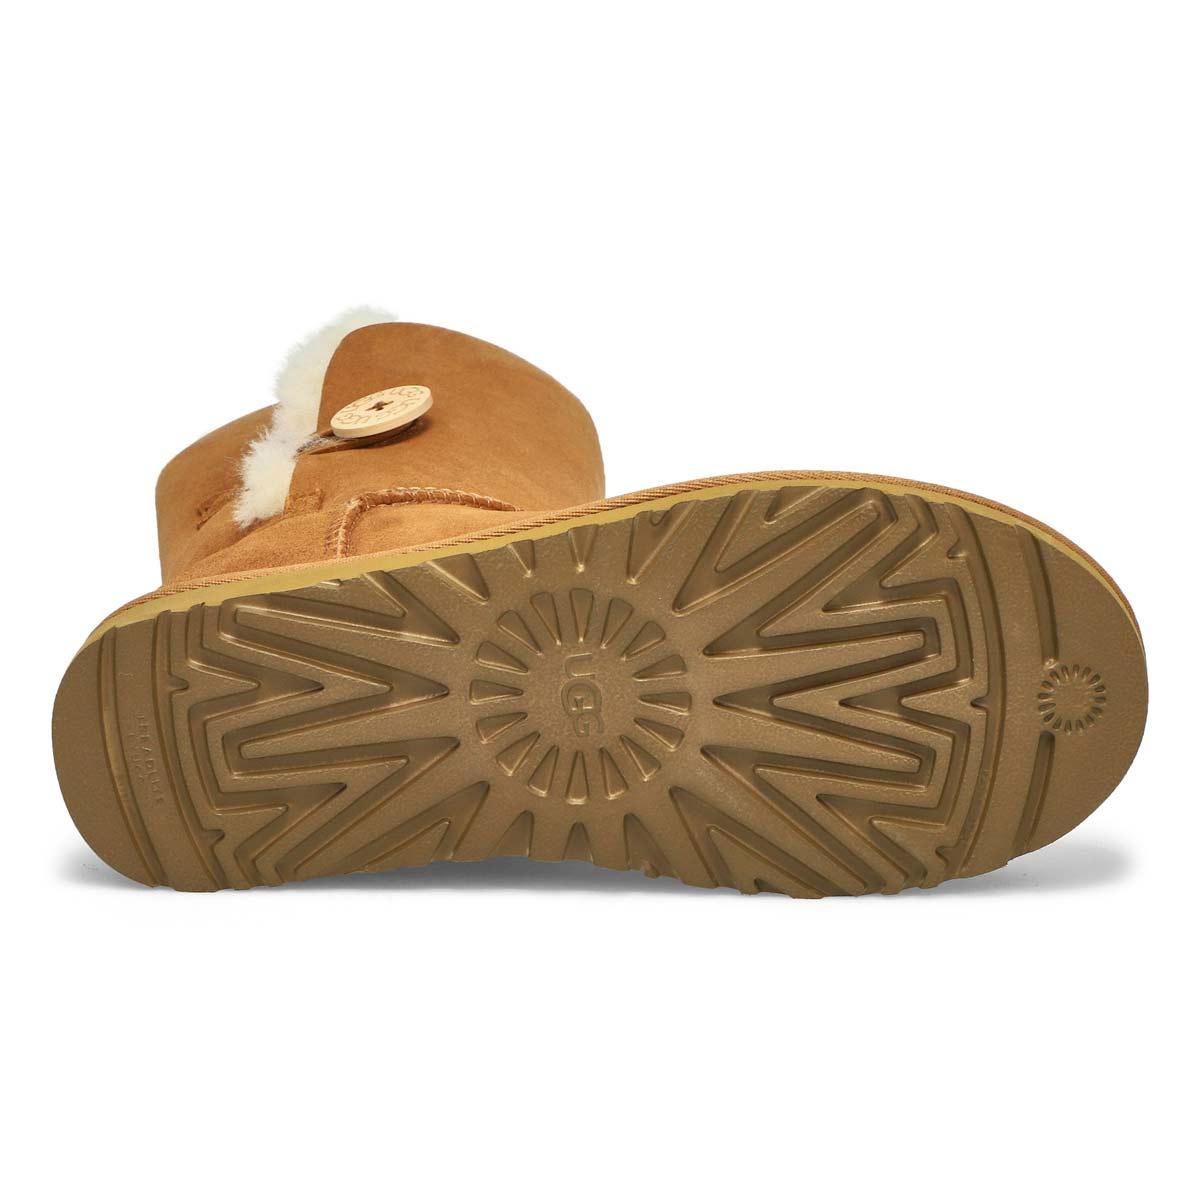 4d4ec653fce Women's BAILEY BUTTON II chestnut sheepskin boots